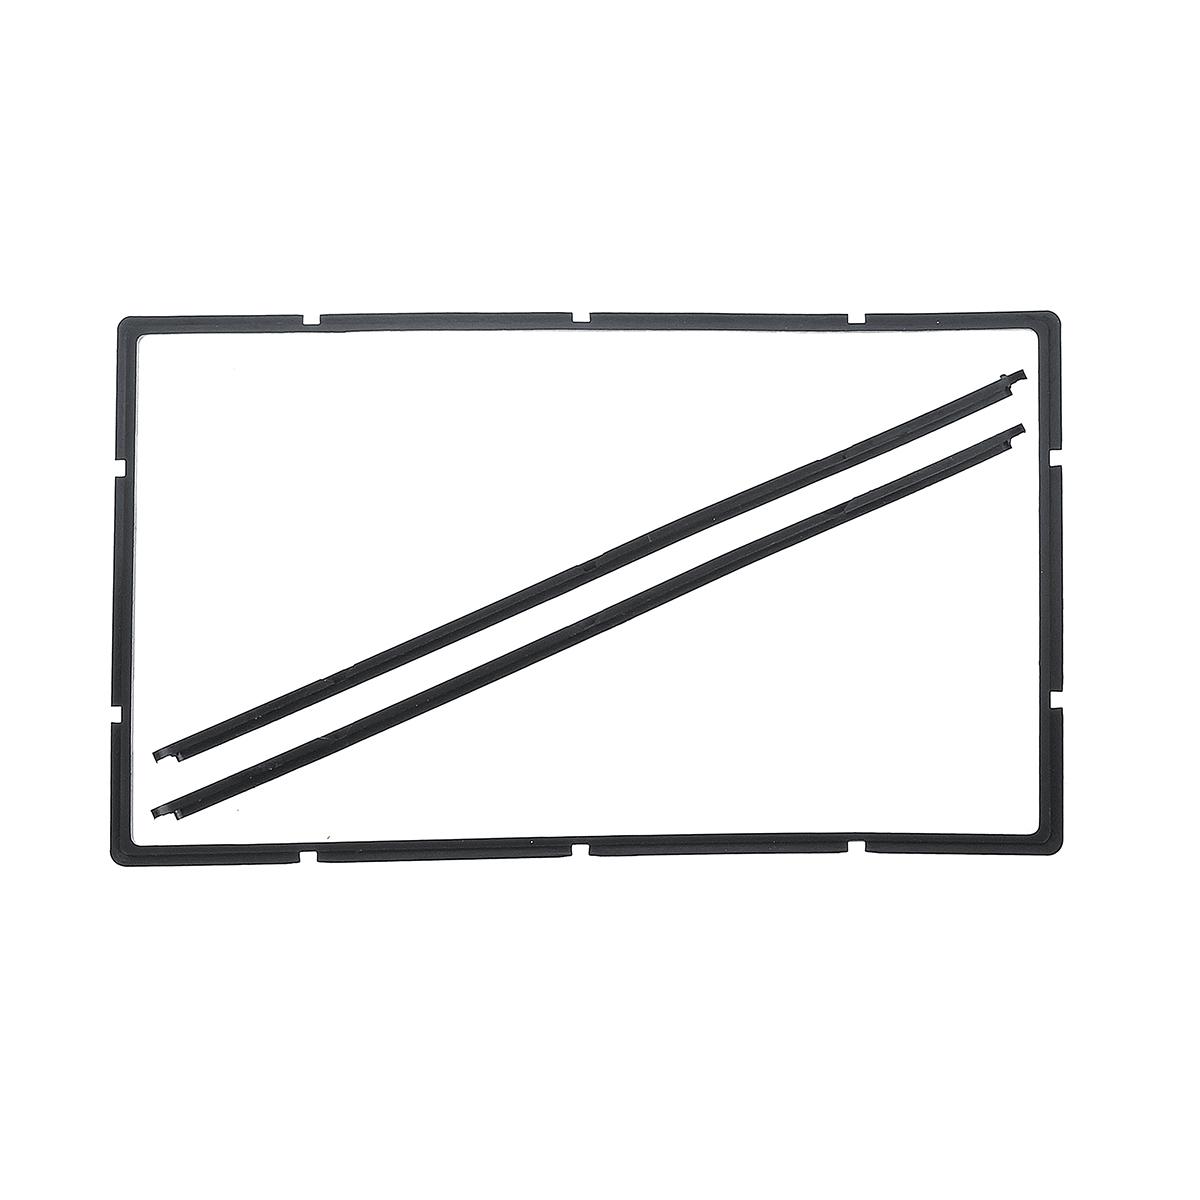 Double 2 din car dashboard stereo panel frame facia trim